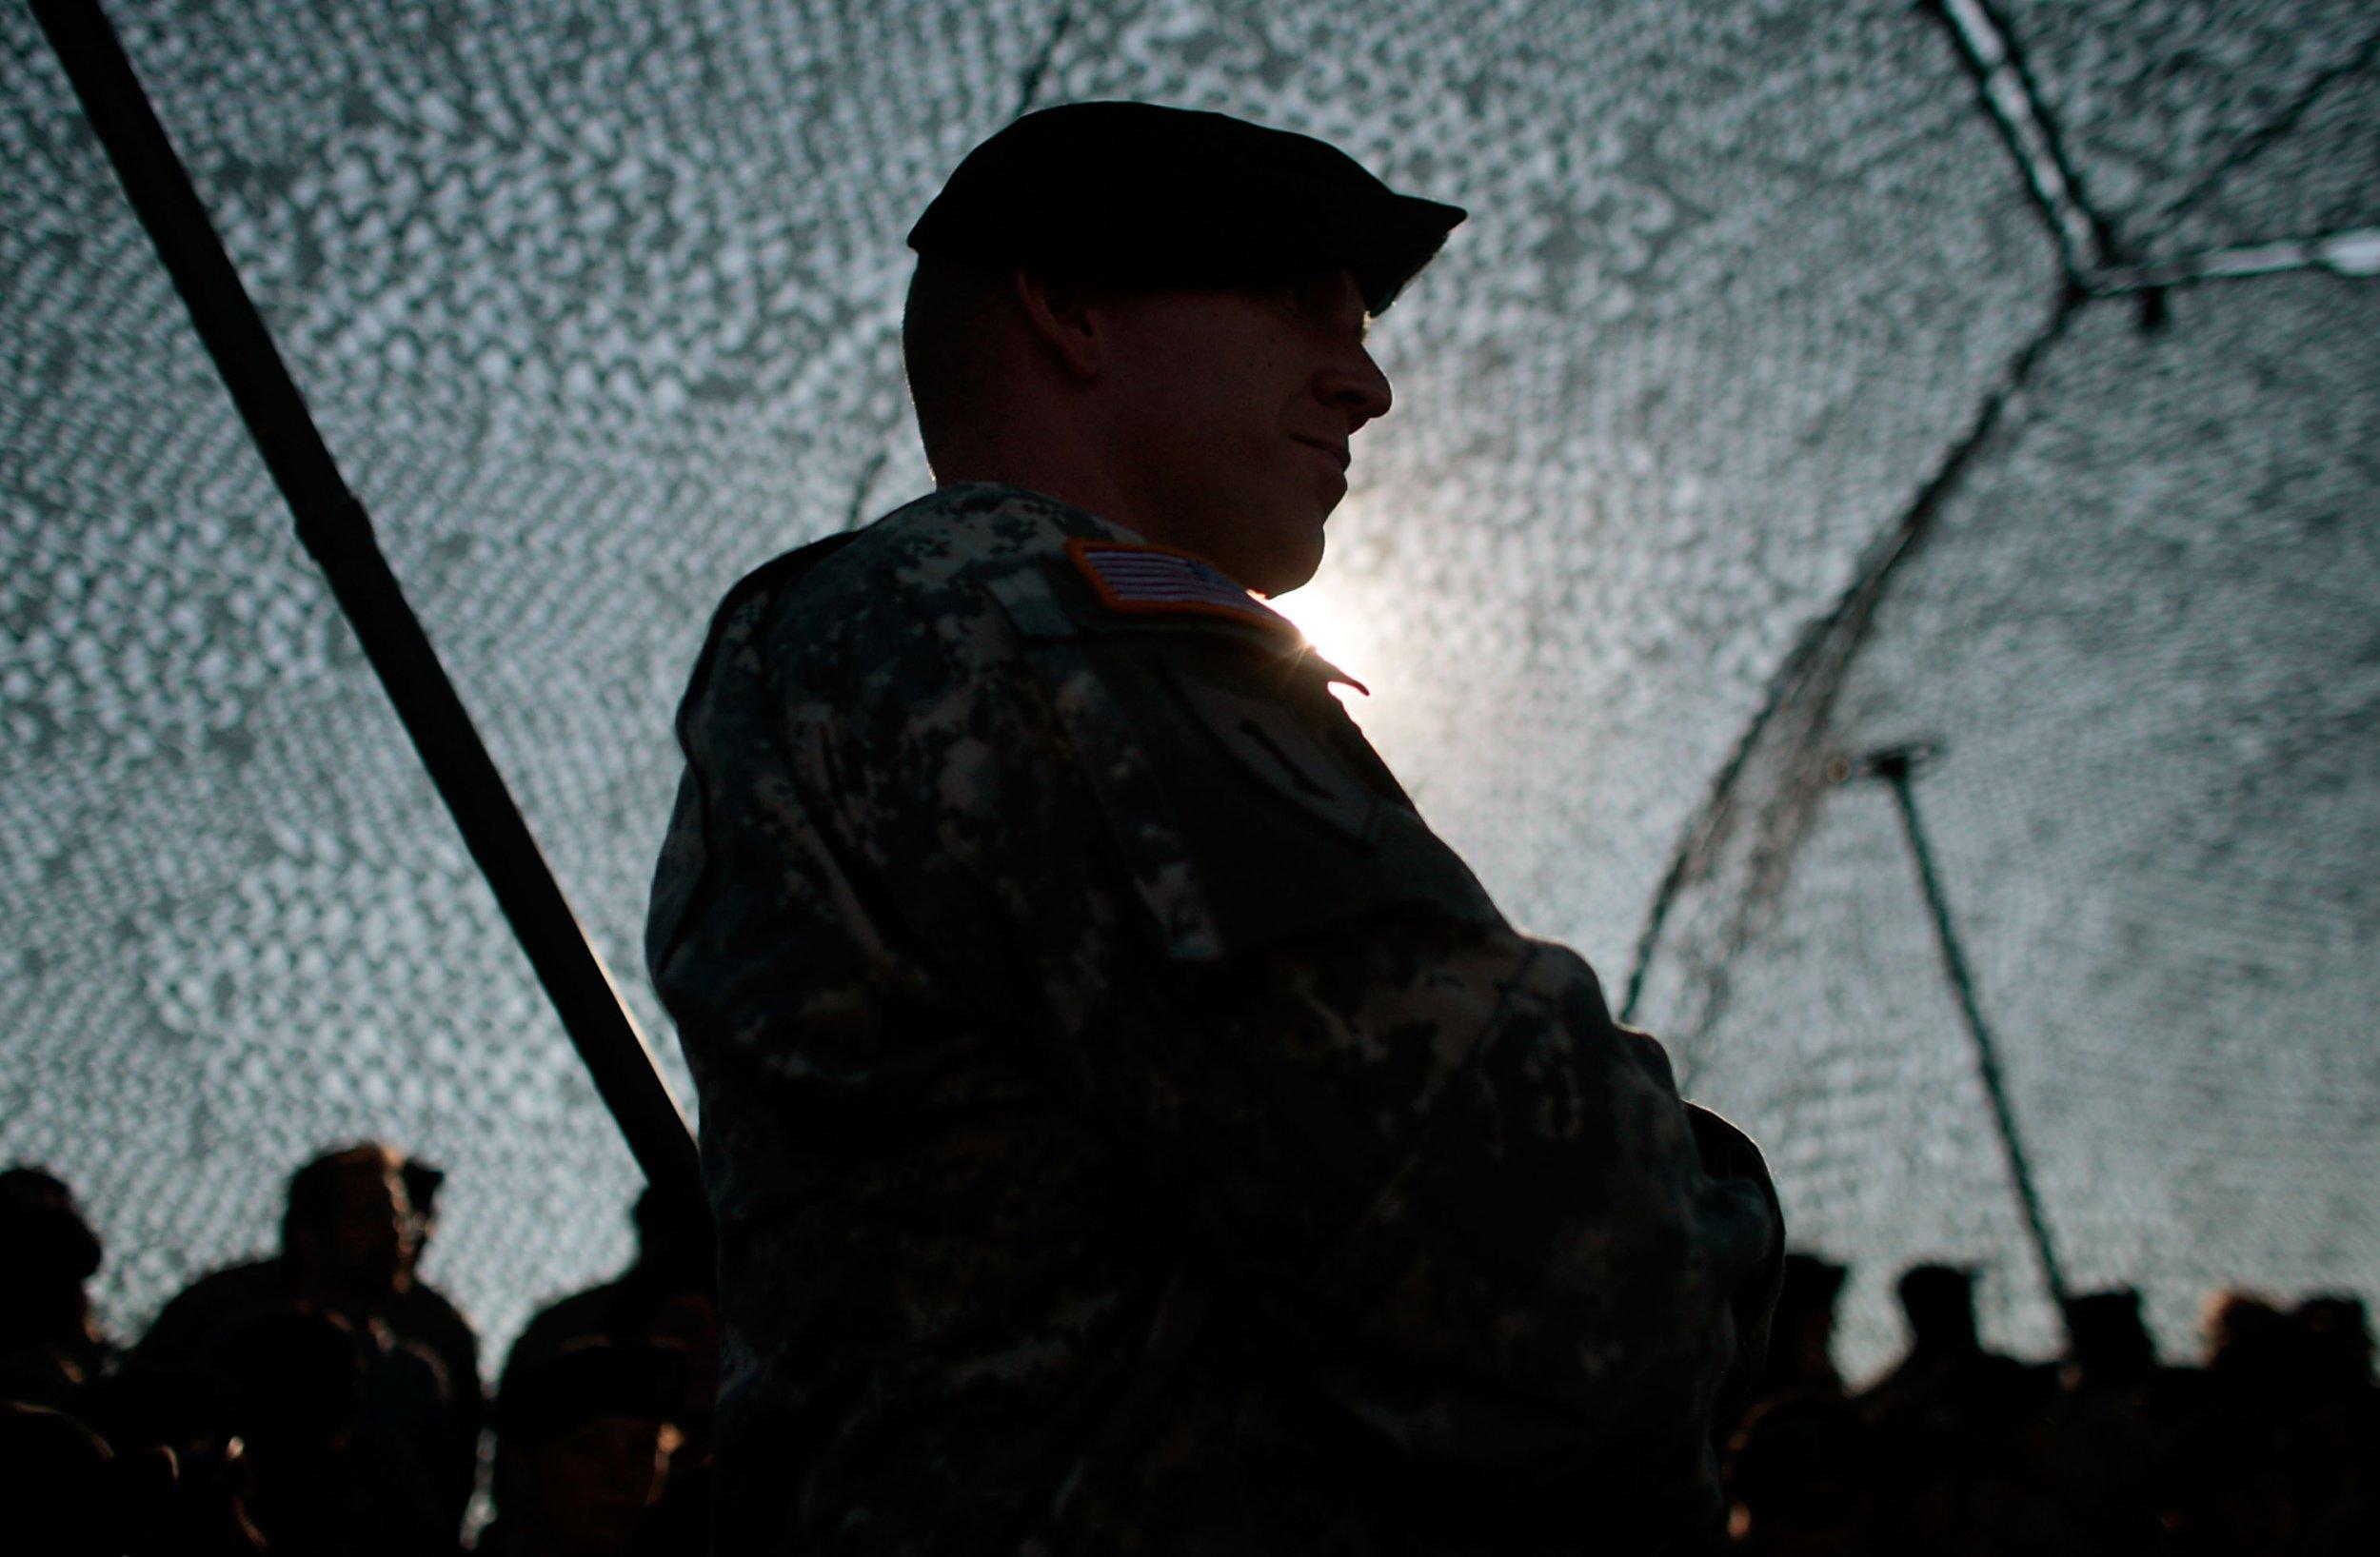 01_15_US_Soldier